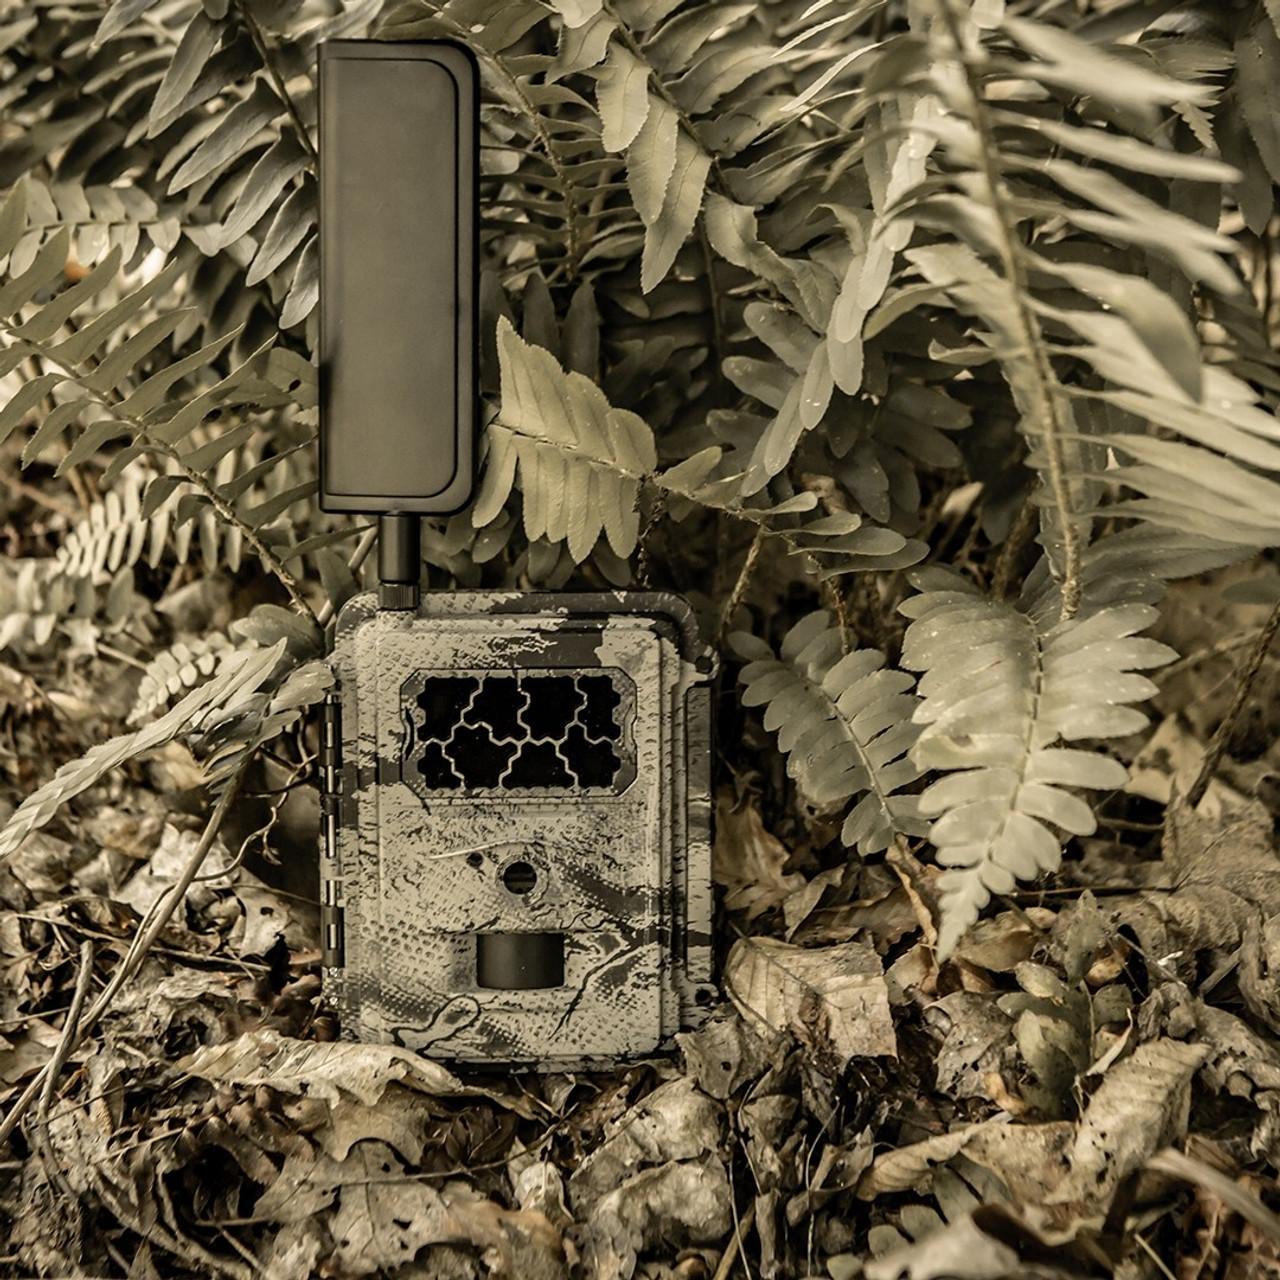 New Spartan Camera Camo